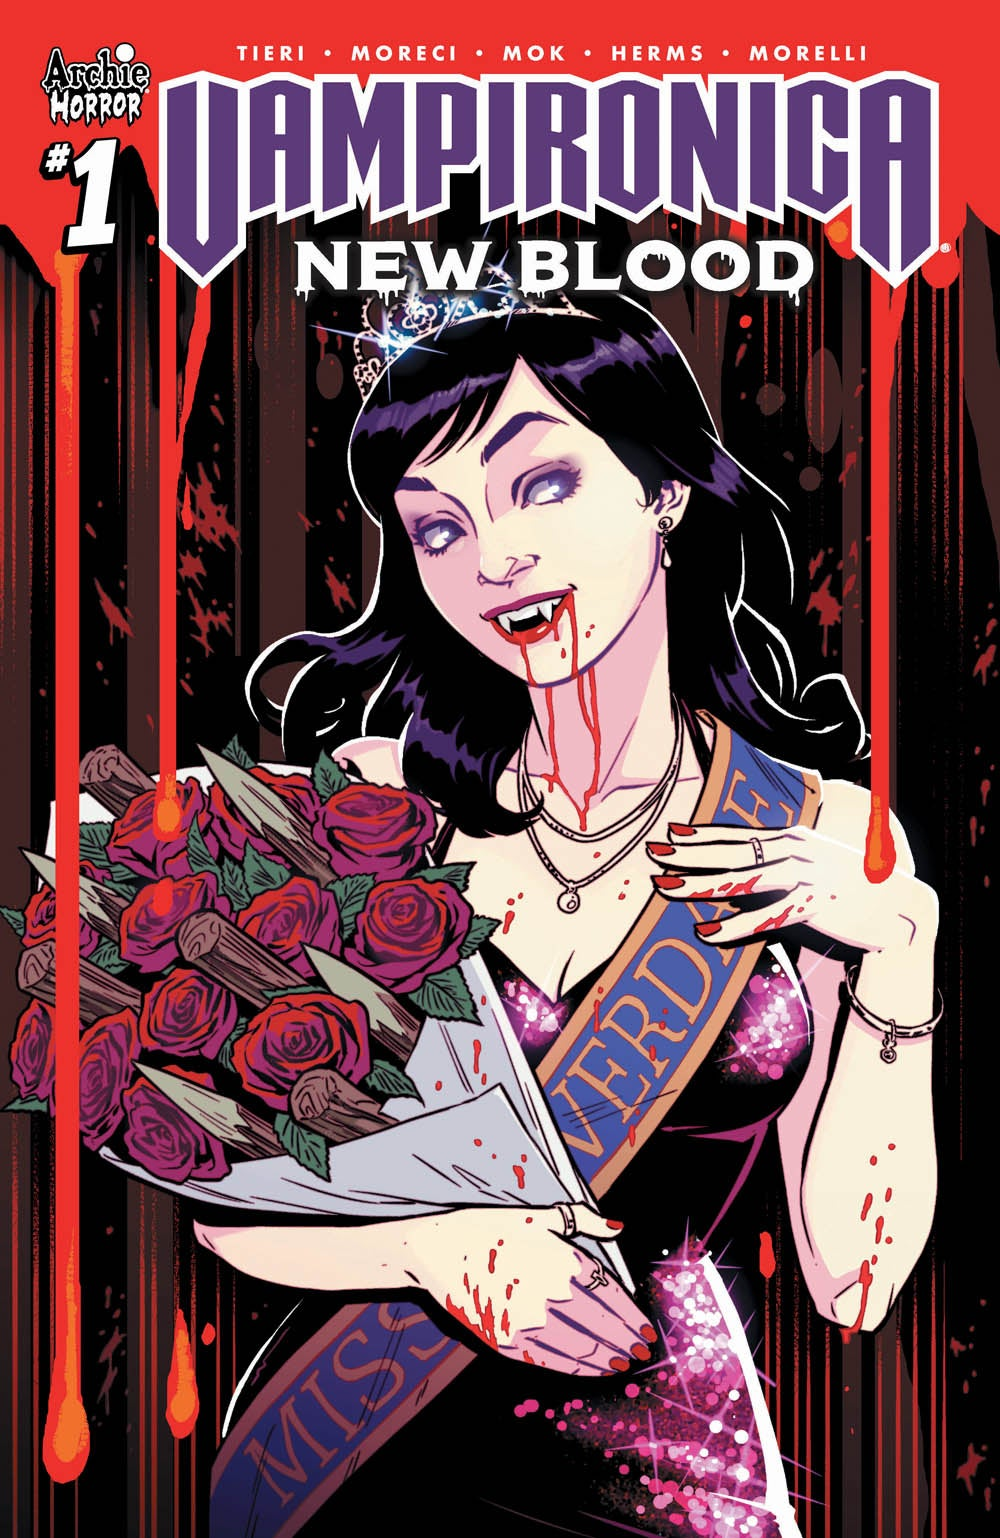 Image: Rebekah Isaacs and Matt Herms, Archie Comics